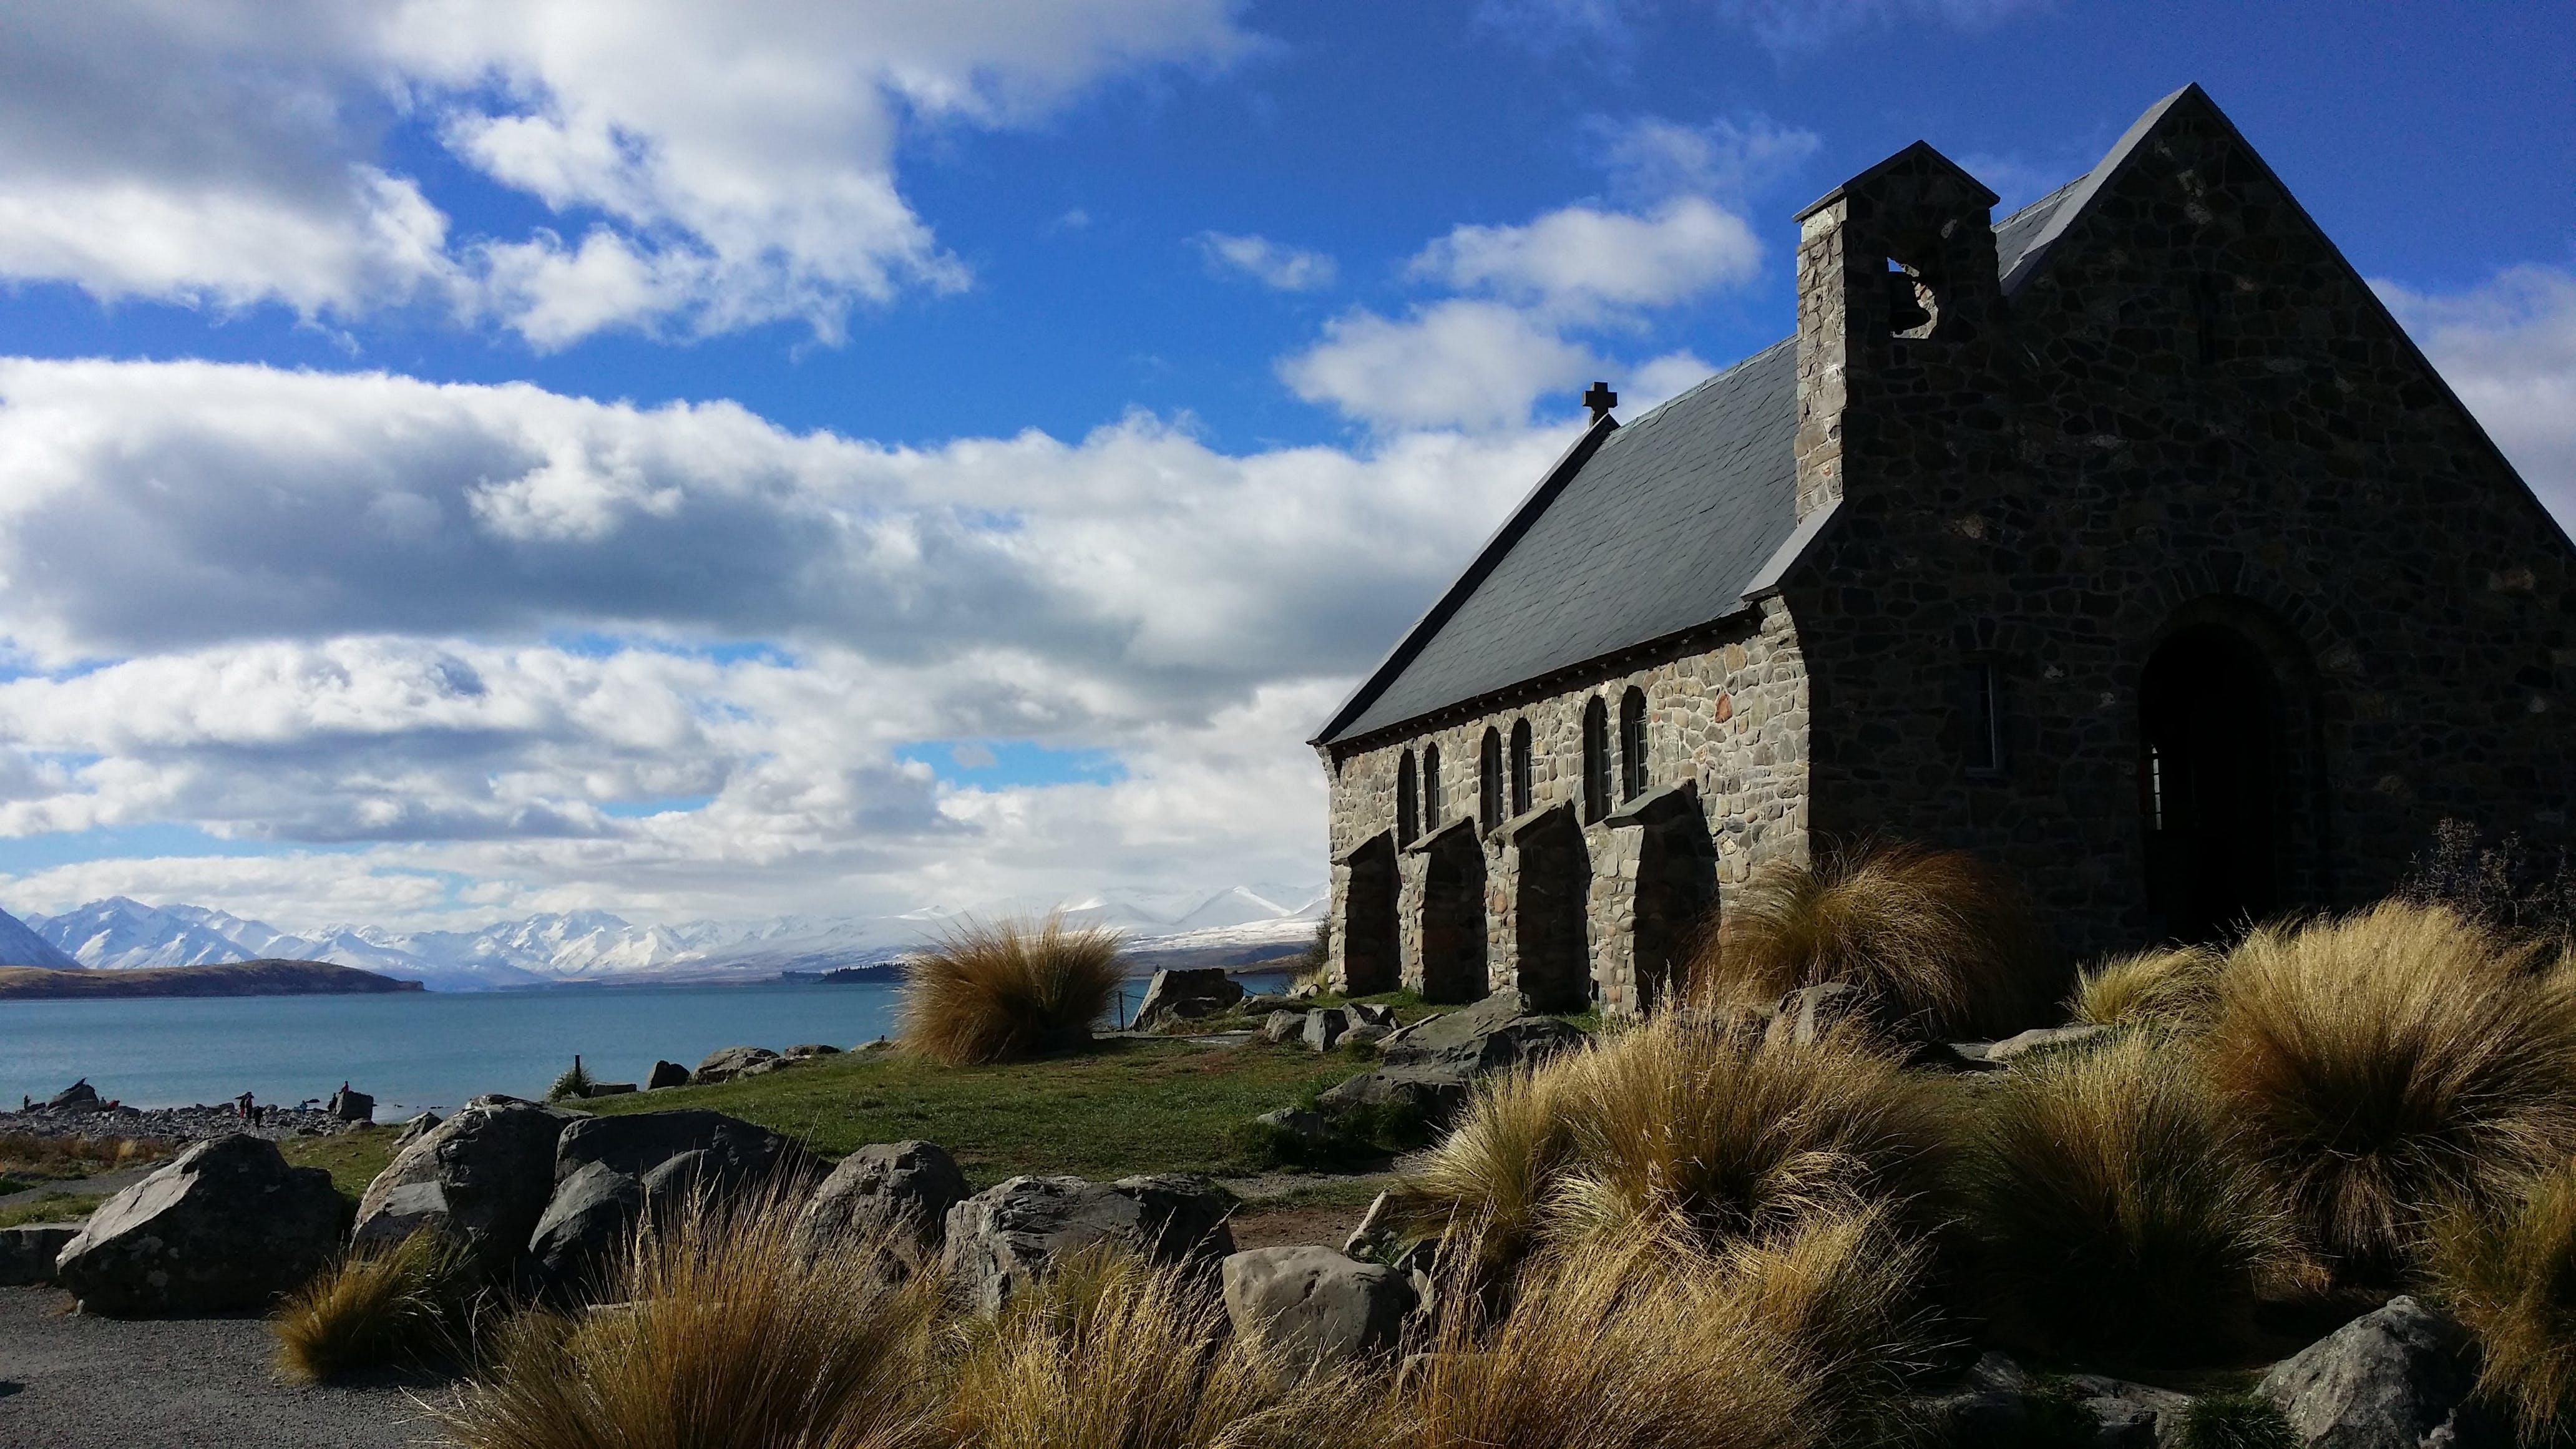 Free stock photo of church, lake, new zealand, shepherd